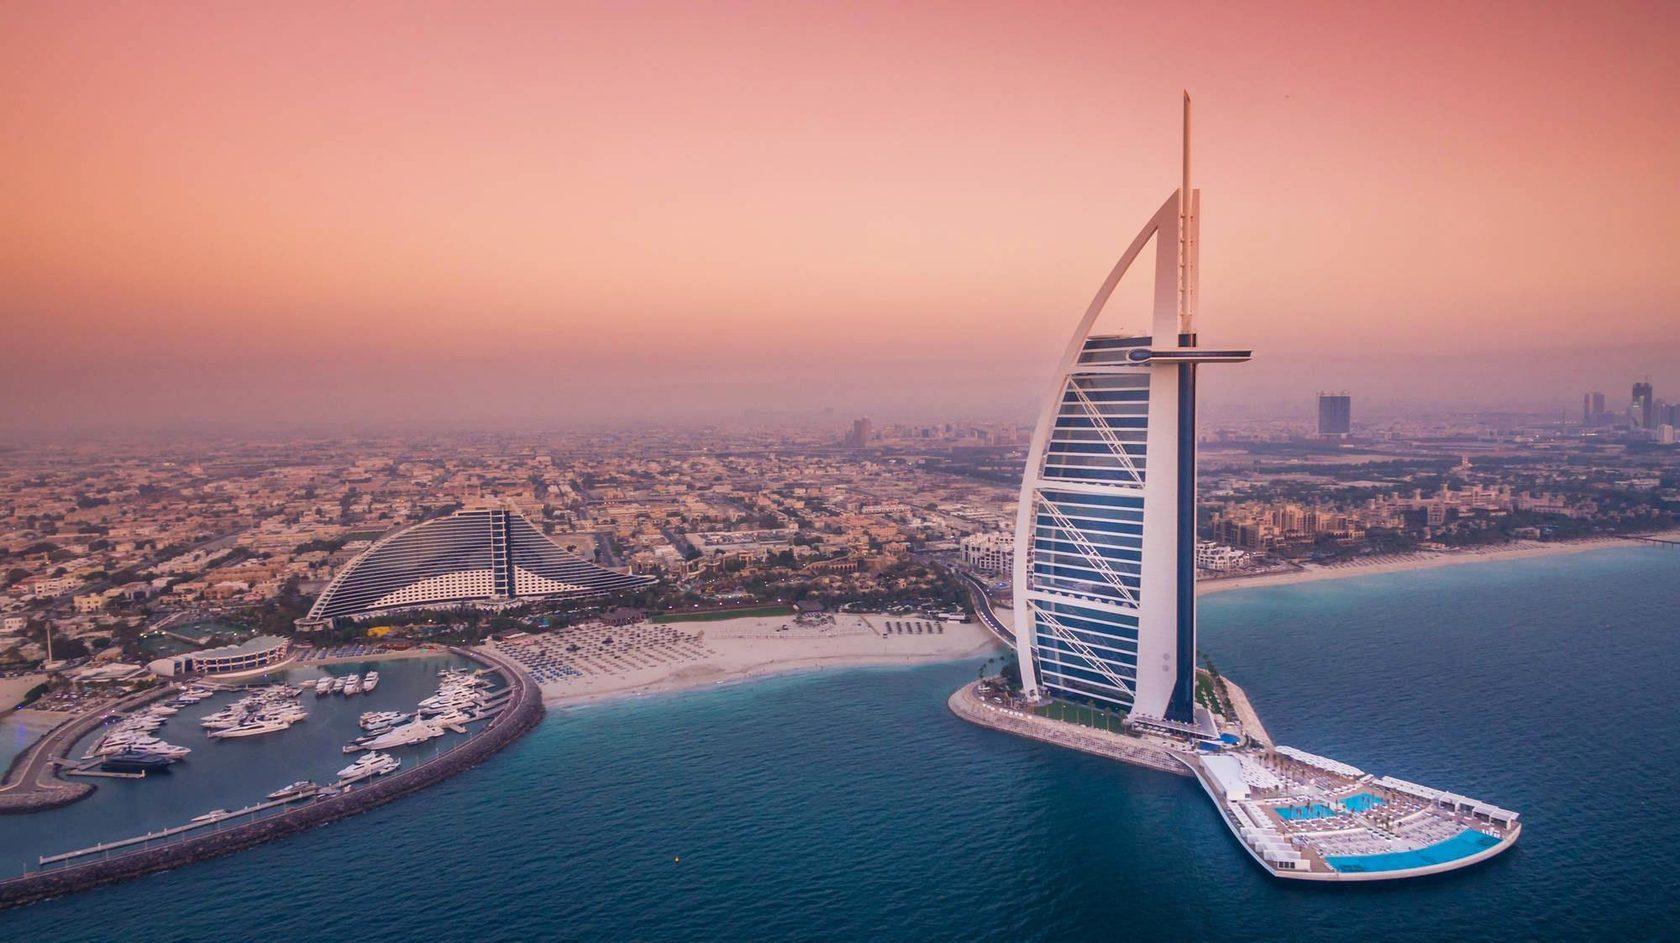 Погода в Дубае в июле